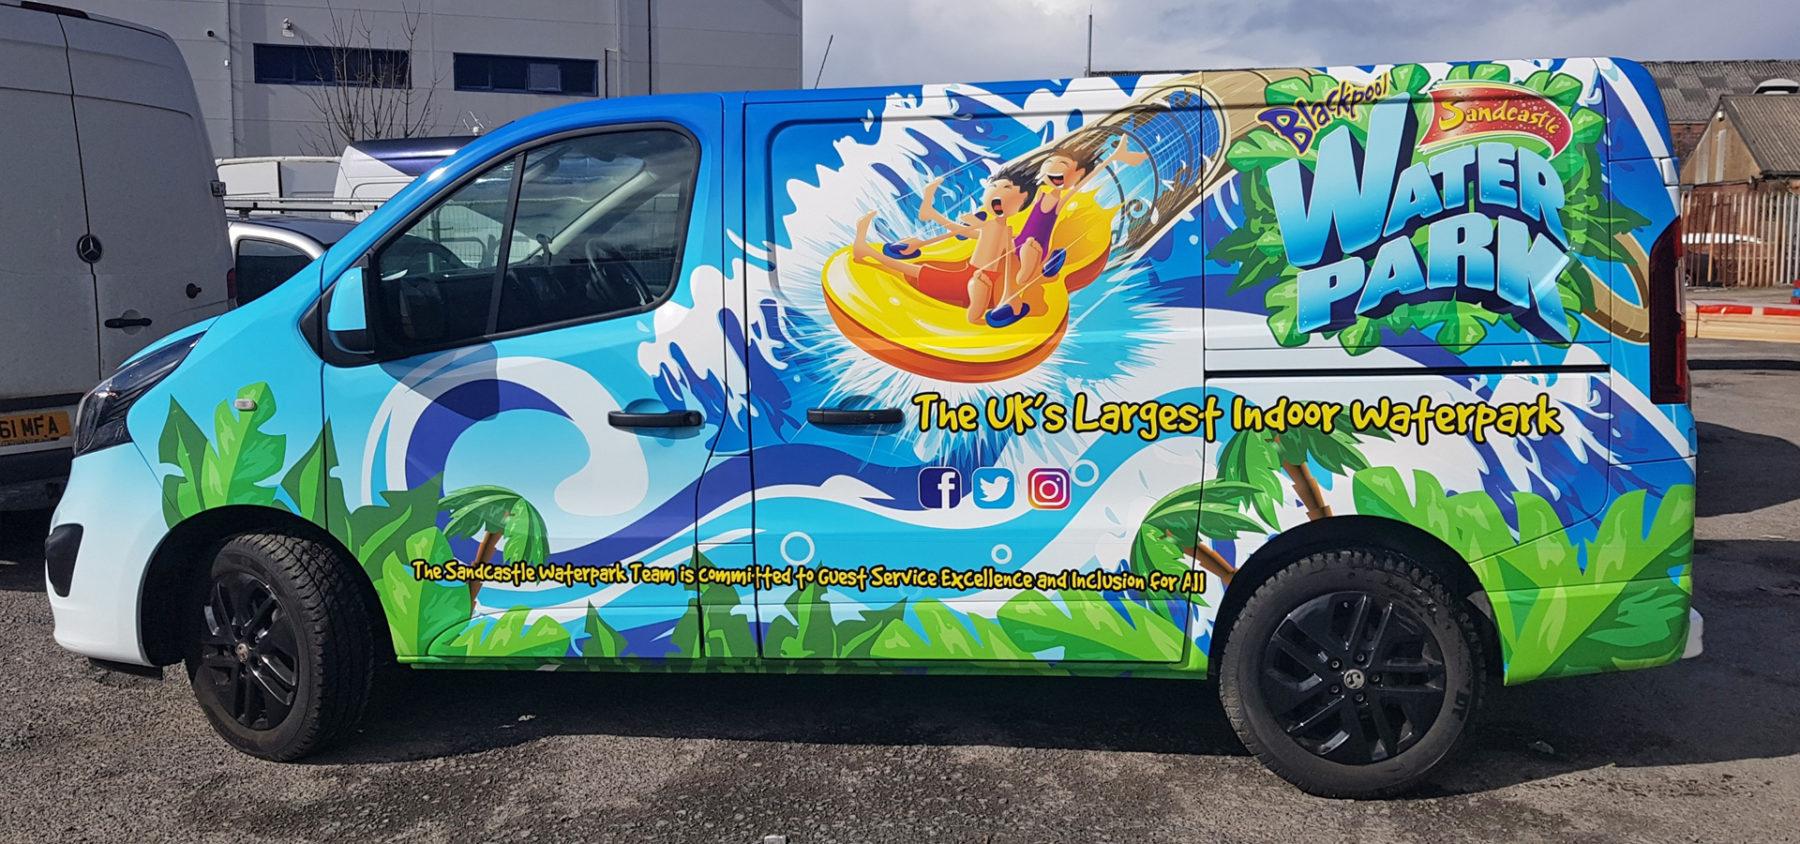 Sandcastle Waterpark van vehicle wraps